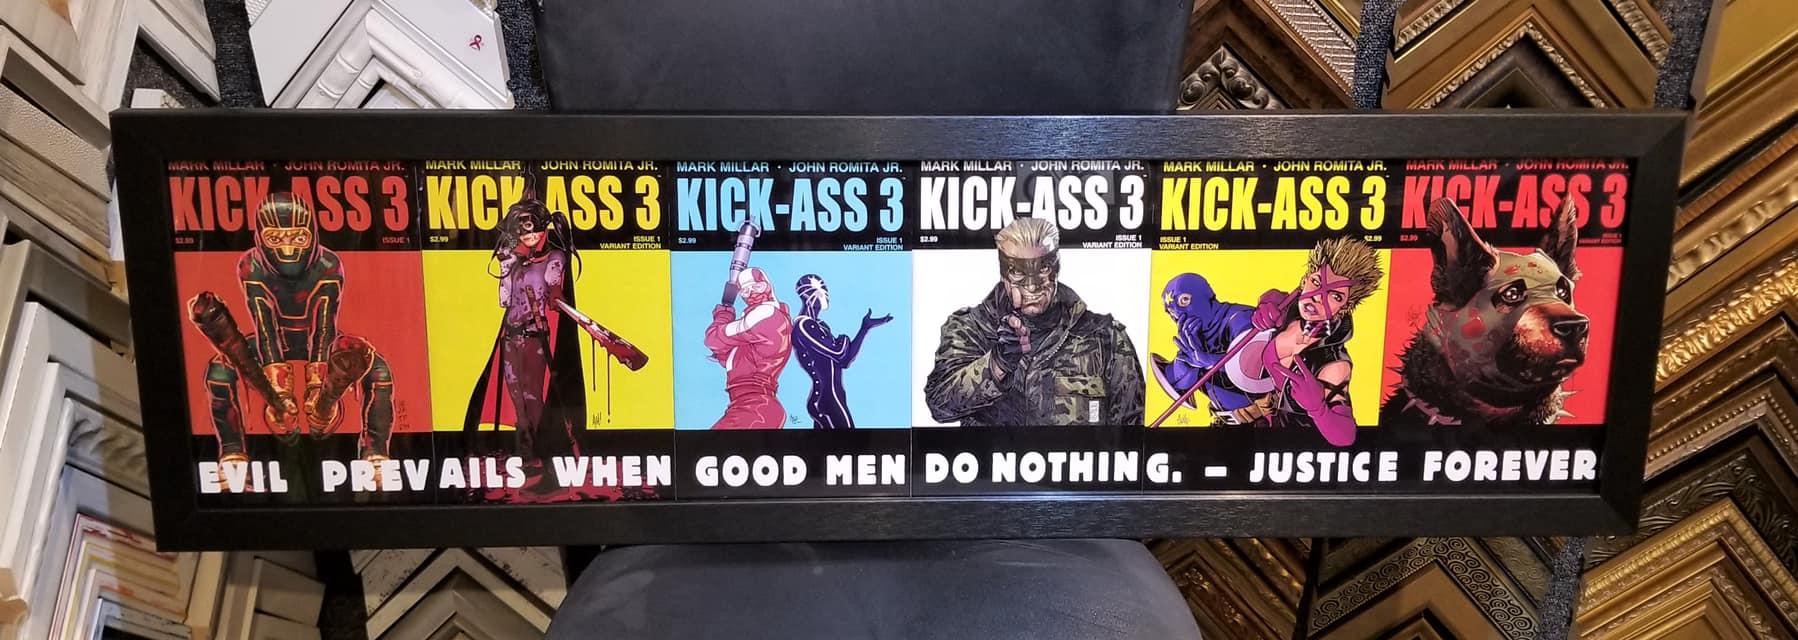 Kick Ass 3 Comic books